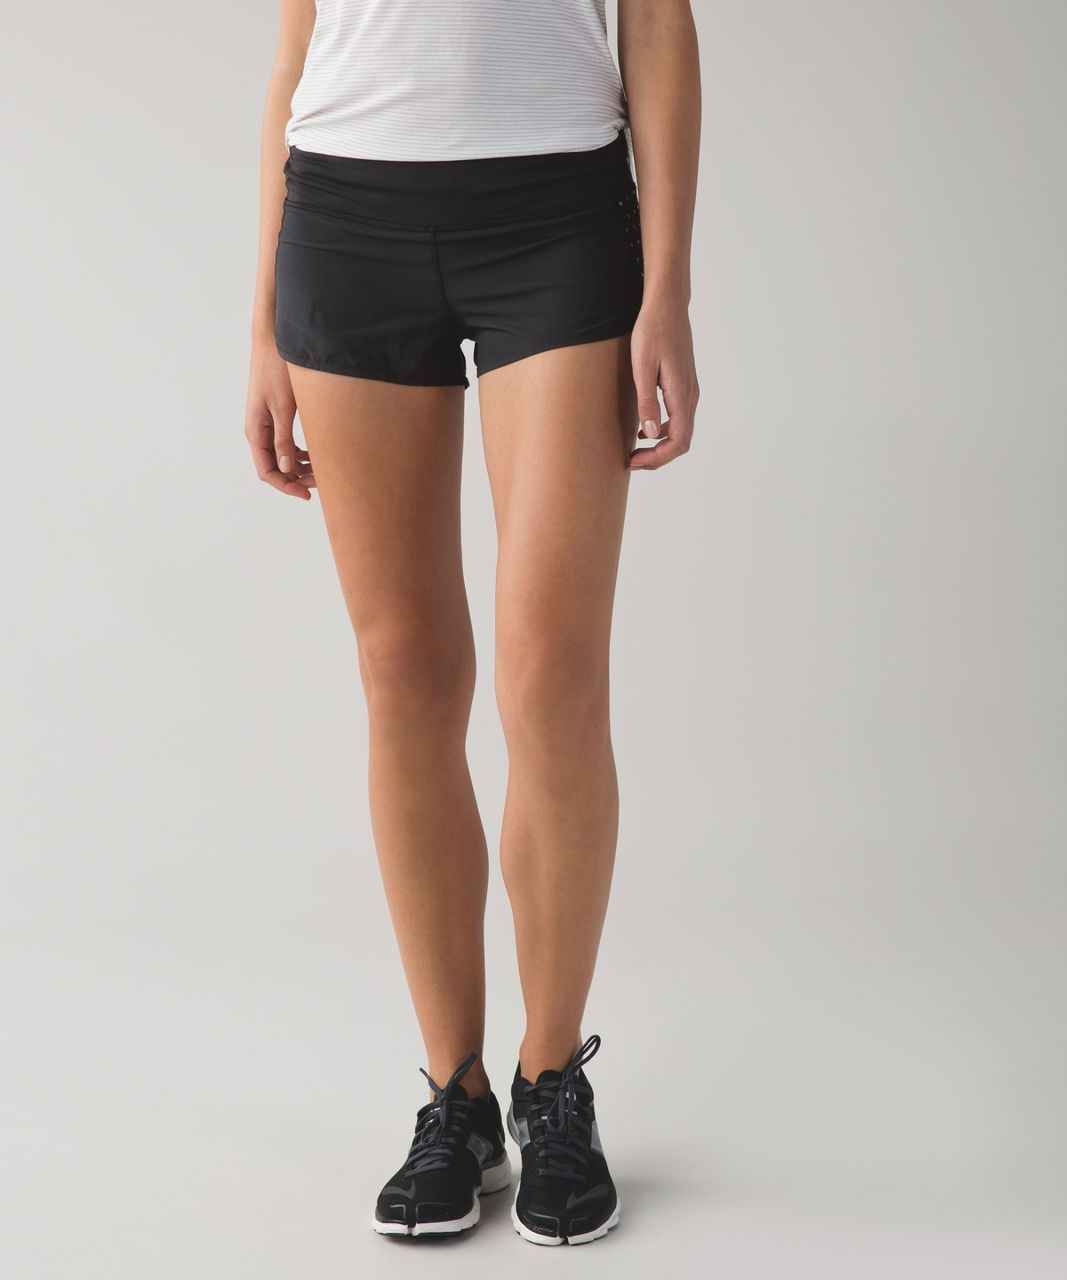 Lululemon Speed Short - Black (Reflective Dots)